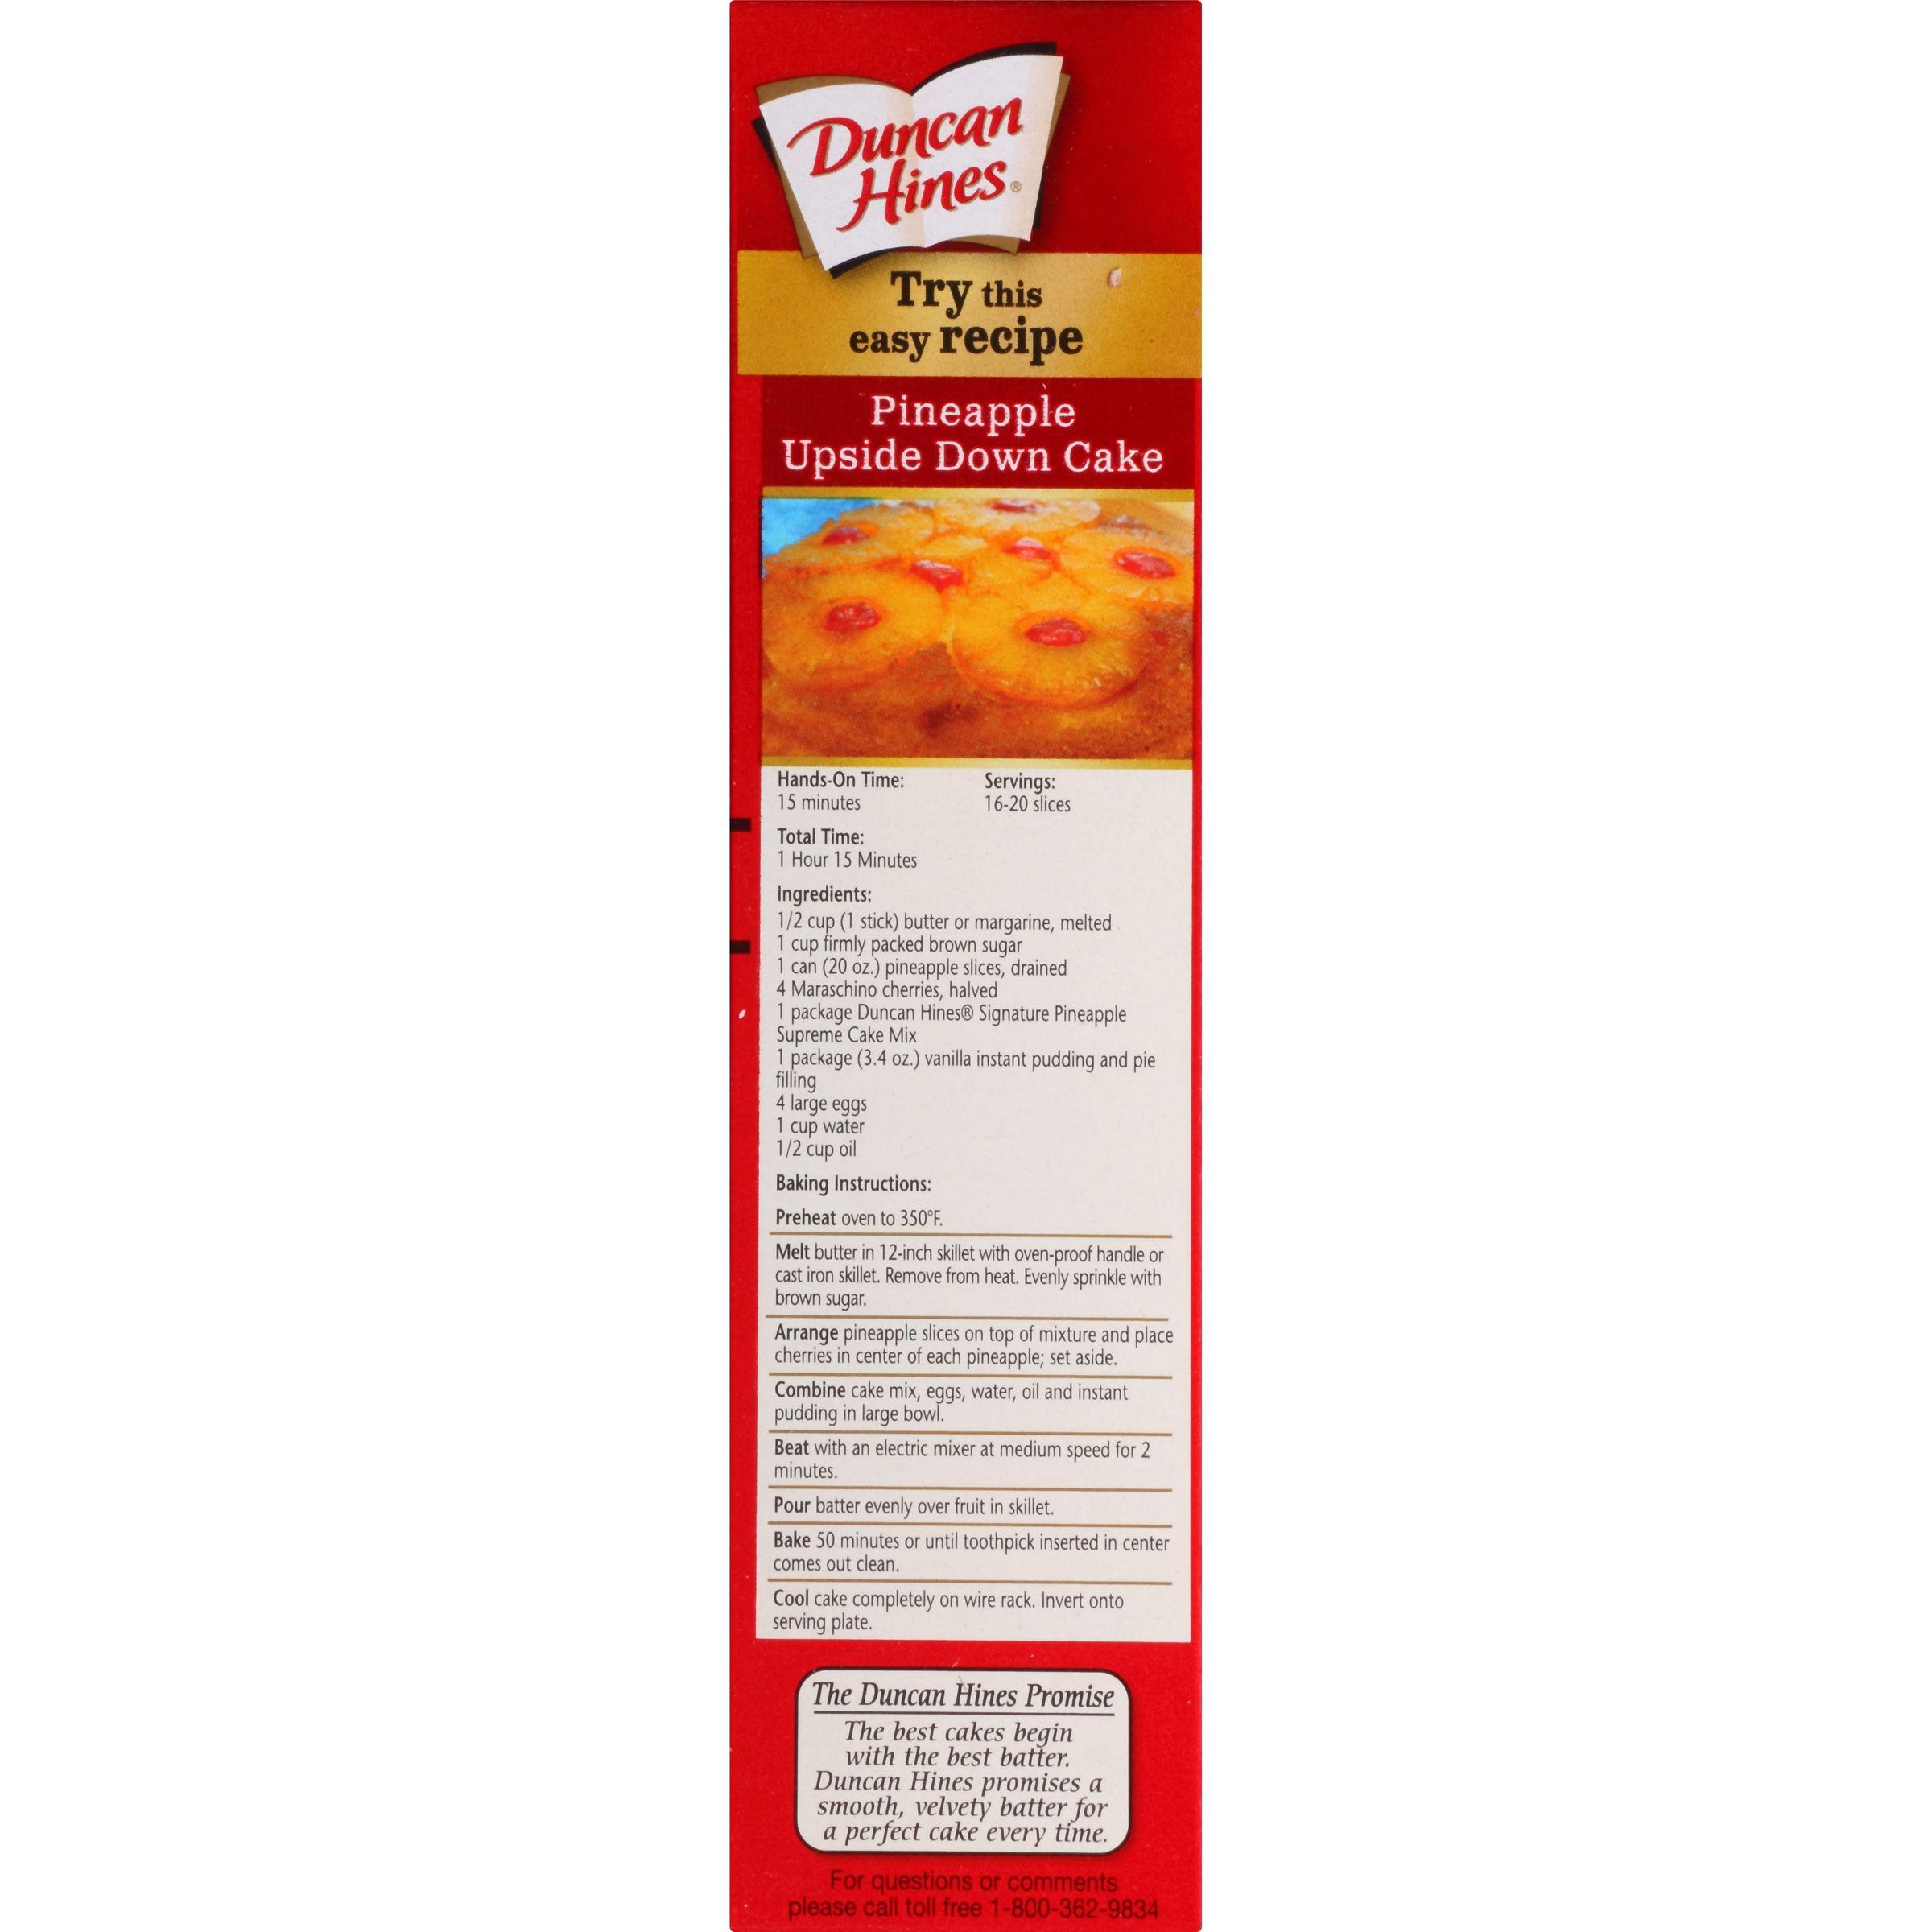 Duncan Hines Moist Deluxe Pineapple Supreme Cake Mix 18 25 Oz Walmart Com Pineapple Upside Down Cake Upside Down Cake Box Cake Recipes